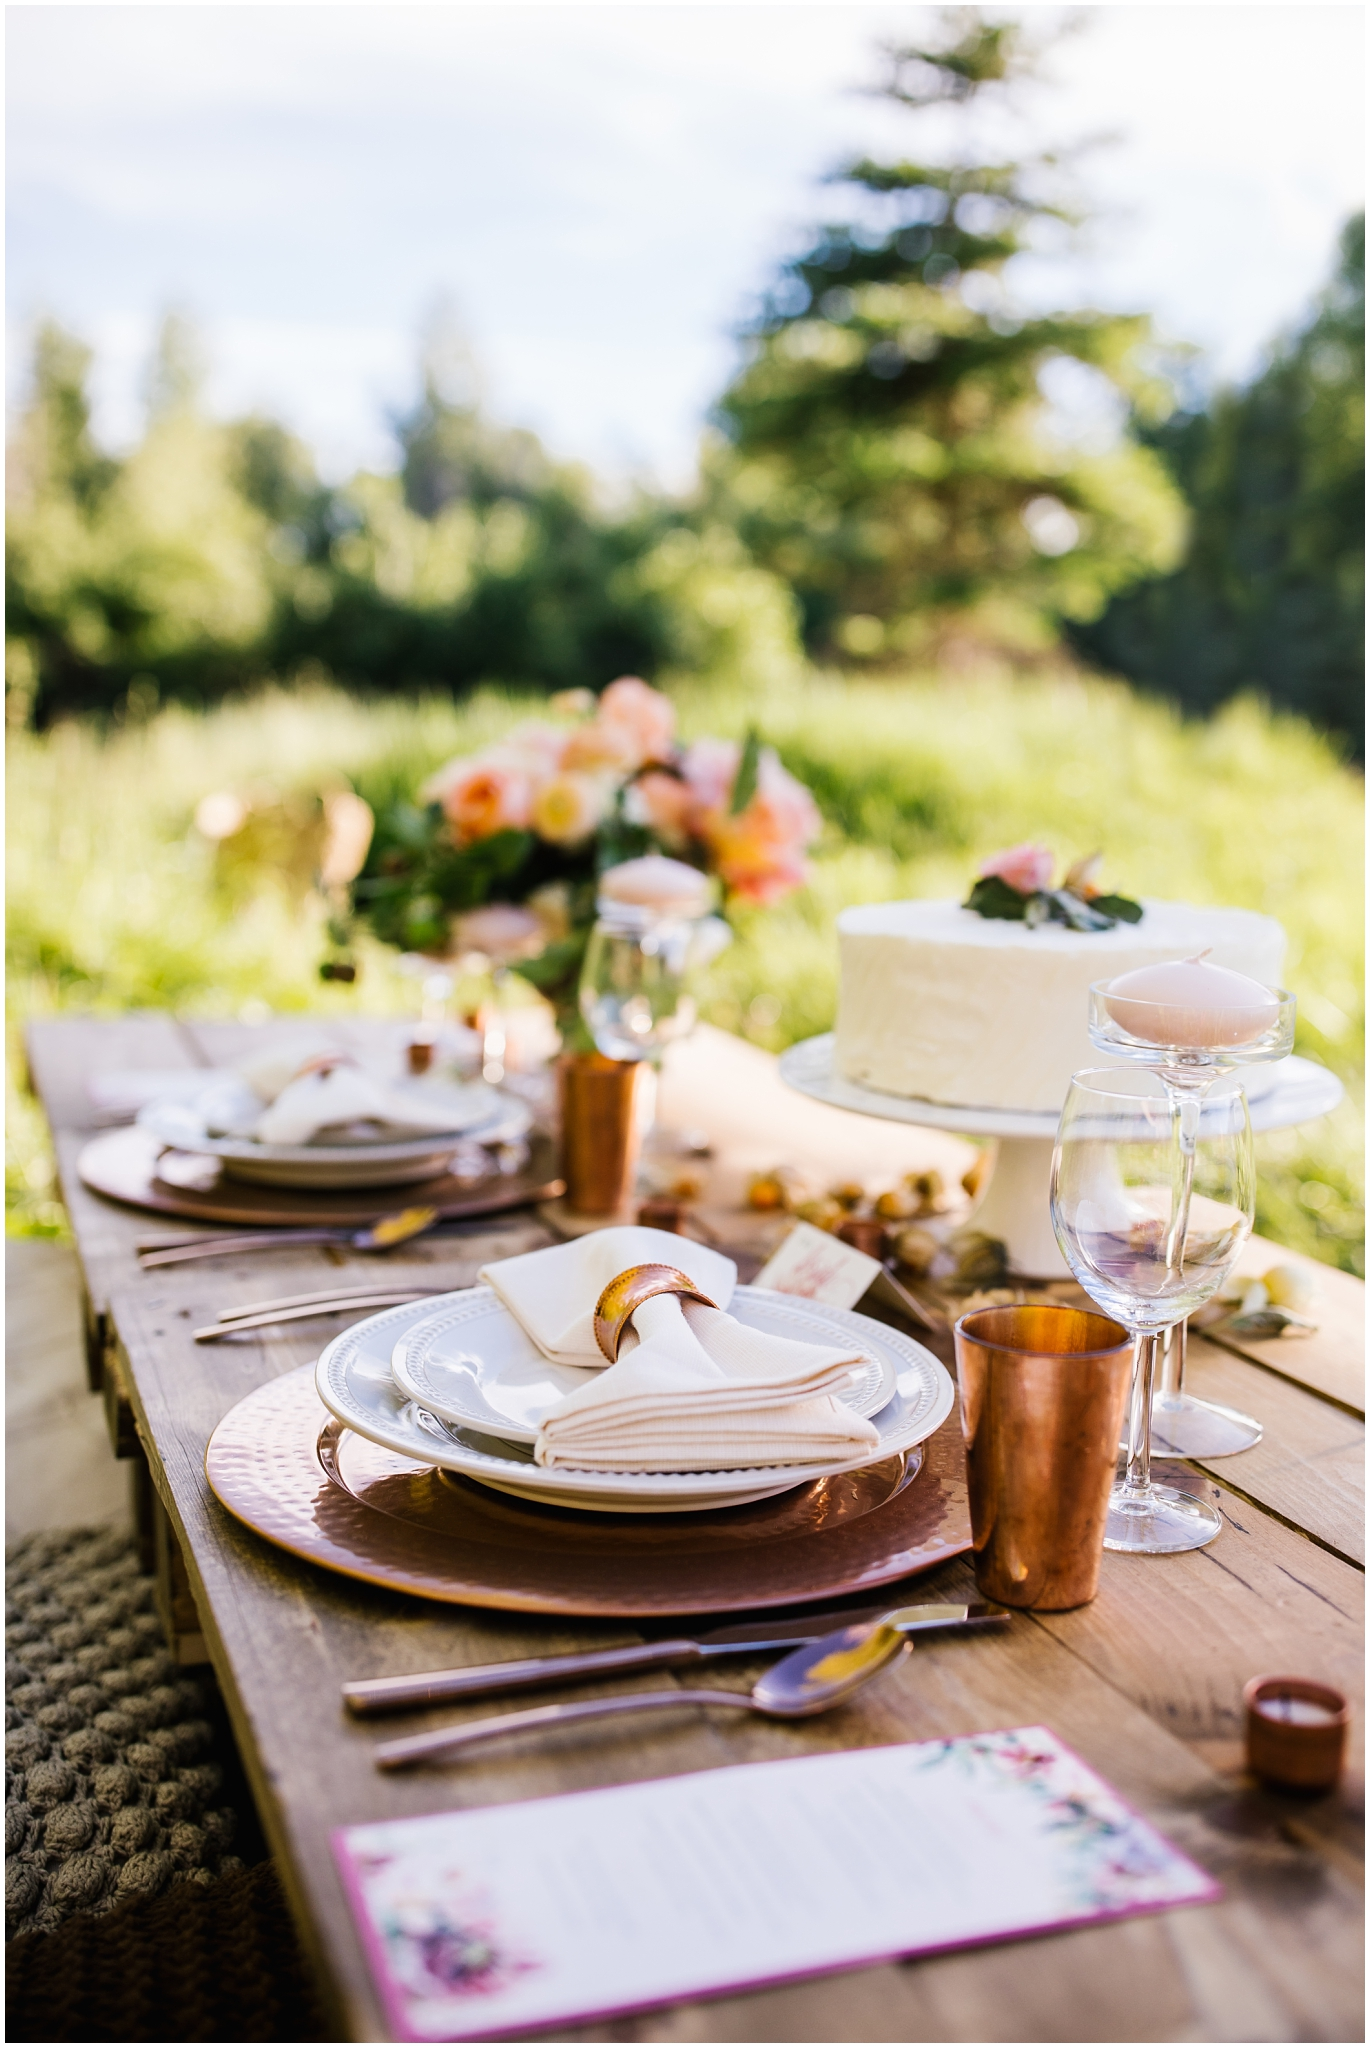 LakeShoot-12_Lizzie-B-Imagery-Utah-Wedding-Photographer-Salt-Lake-City-Park-City-Oakley.jpg